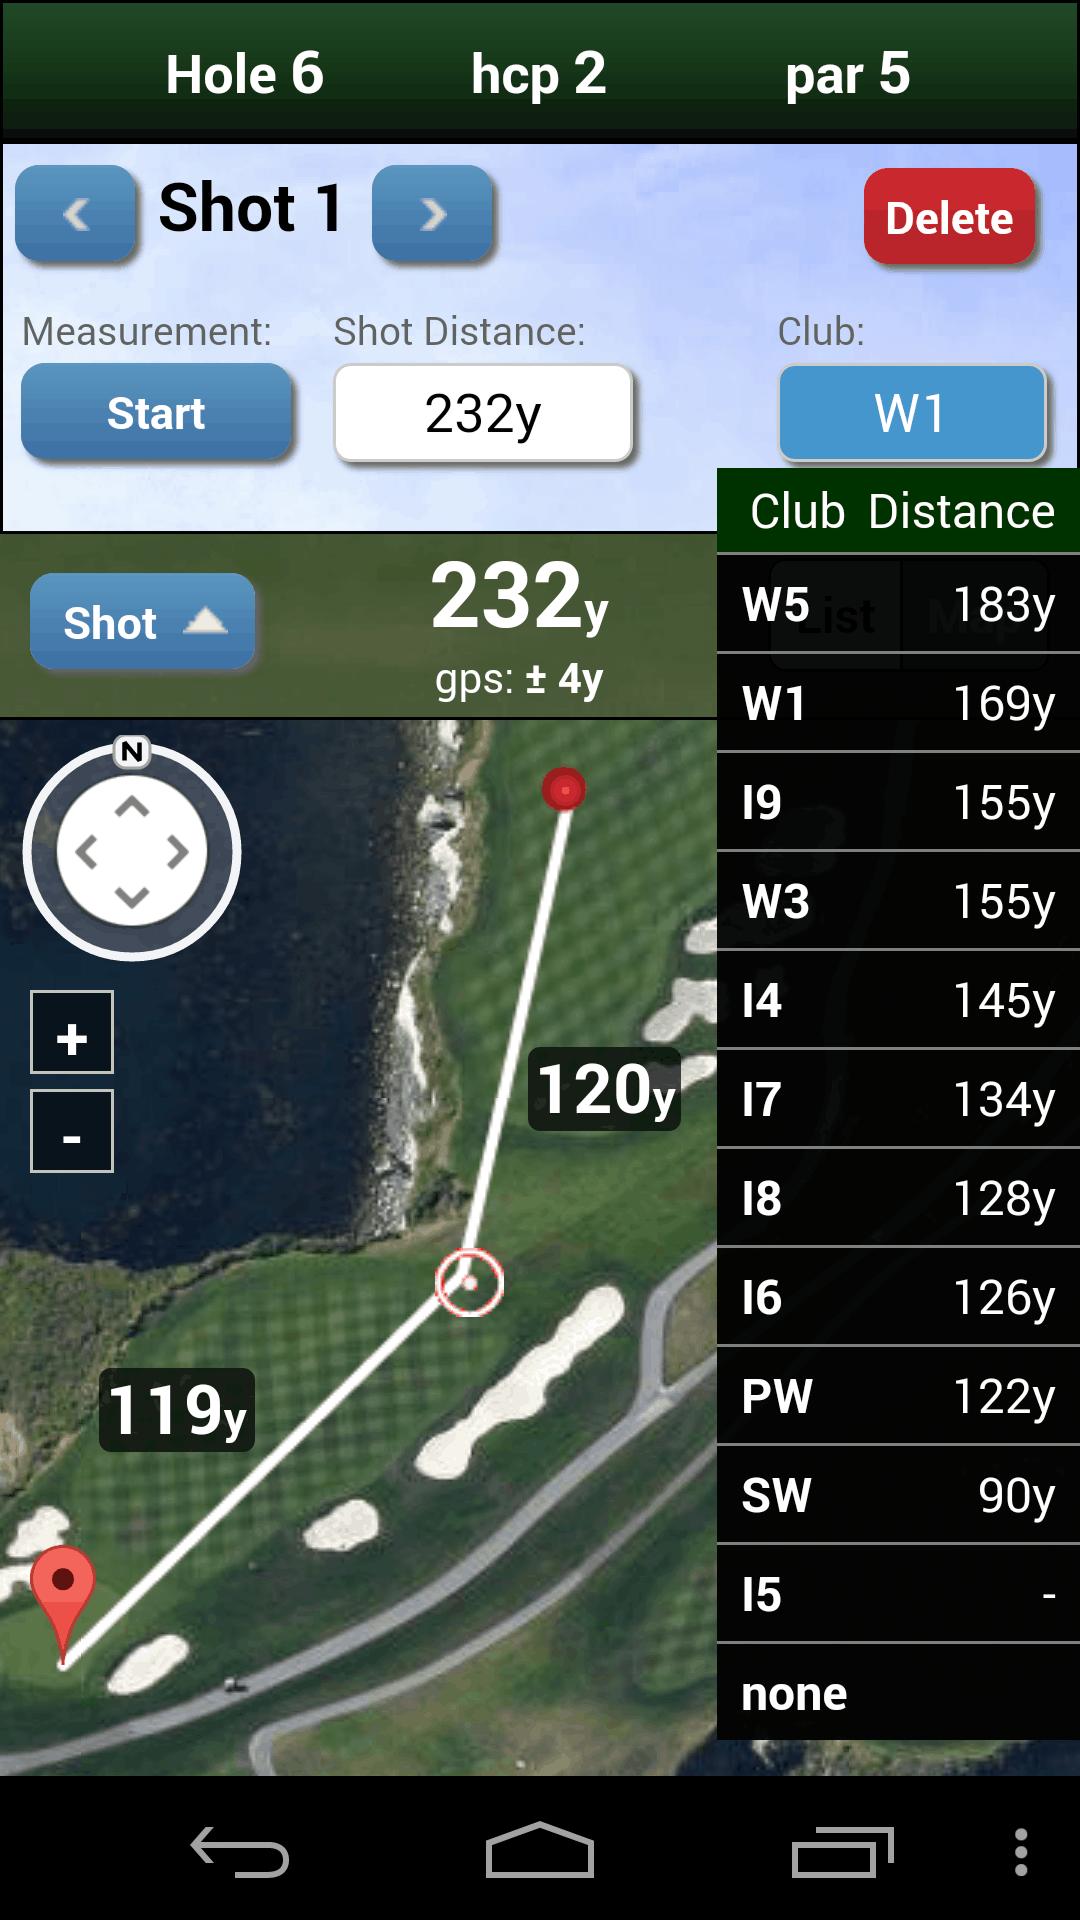 mScorecard golf app